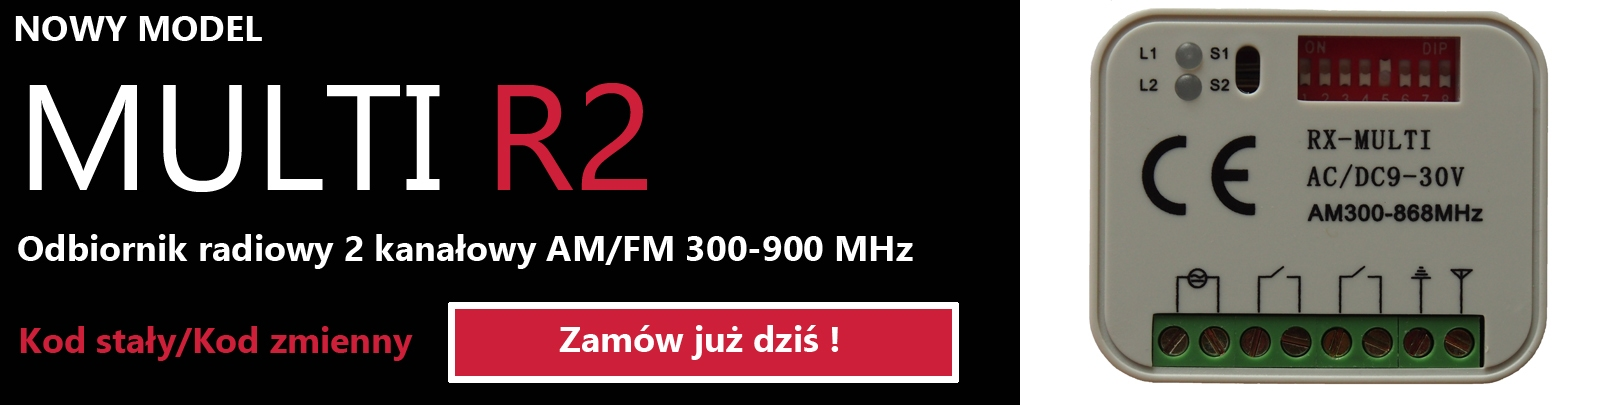 Odbiornik radiowy MULTI R2 300-900 MHz